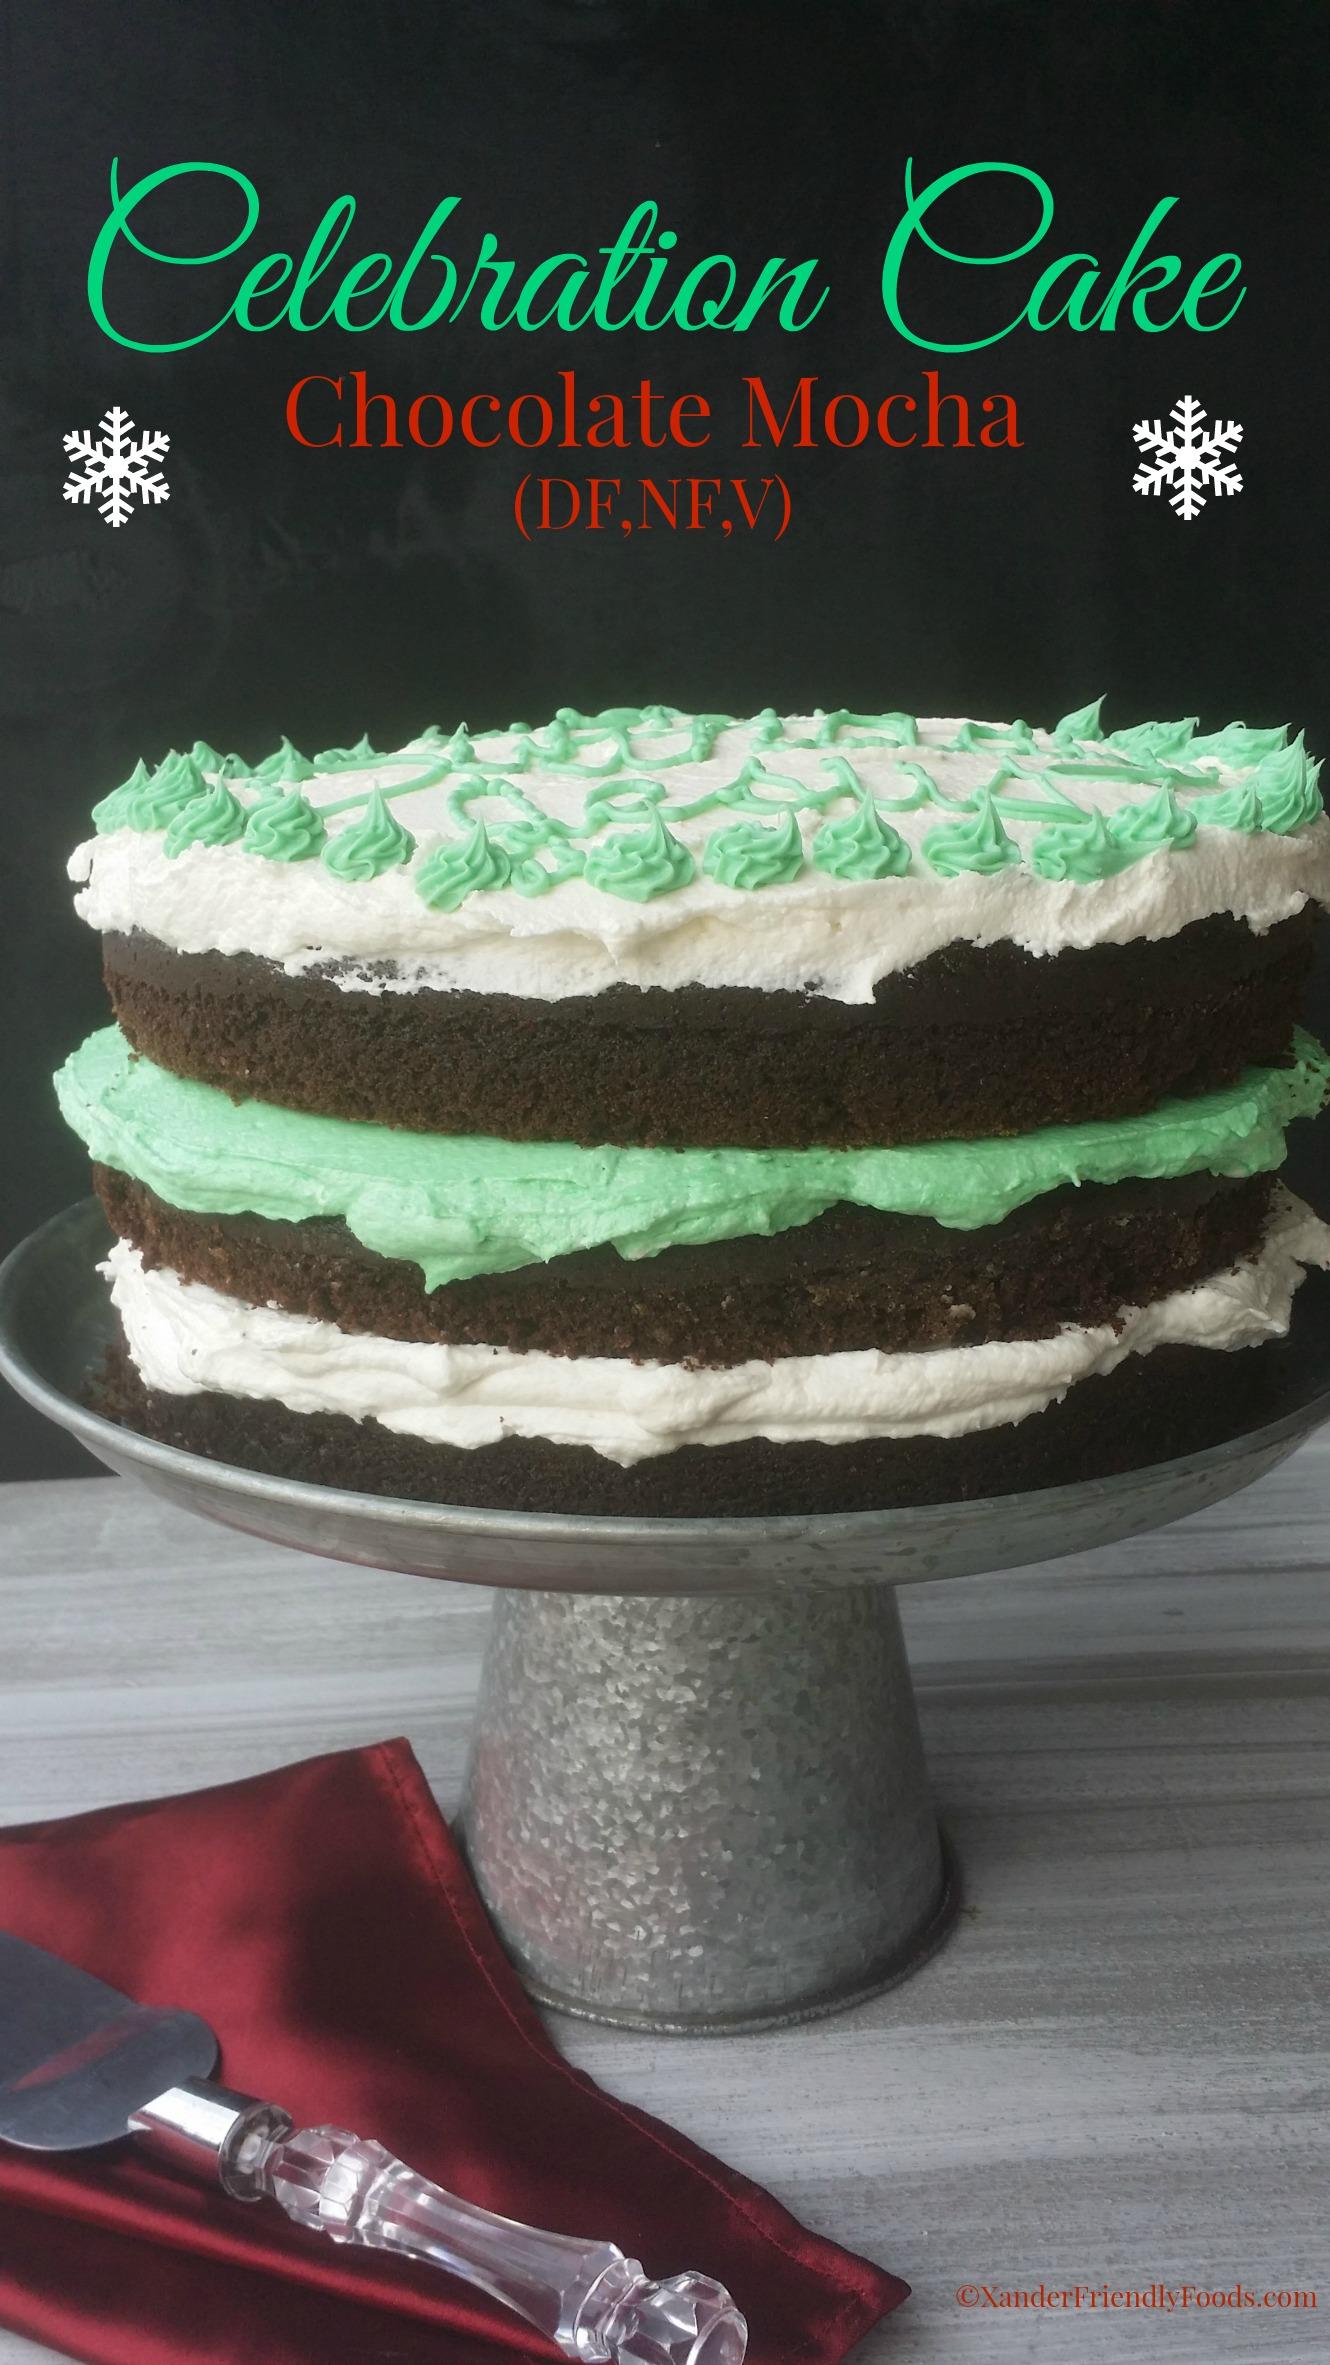 Chocolate Mocha Cake for any upcoming celebration. {DF,NF,V)